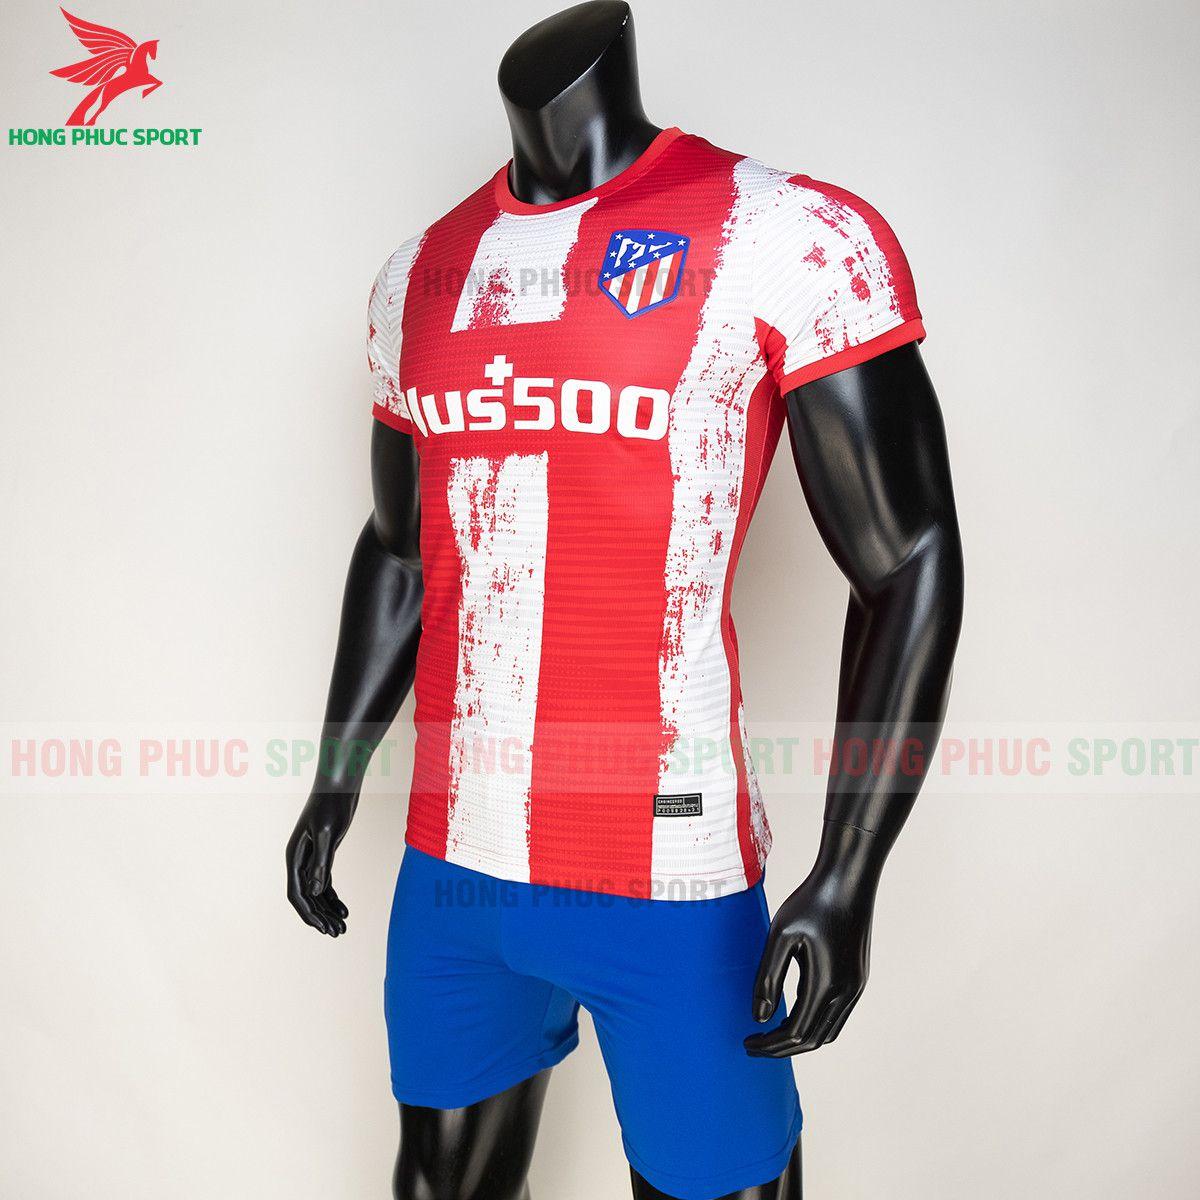 https://cdn.hongphucsport.com/unsafe/s4.shopbay.vn/files/285/ao-bong-da-atletico-madrid-2021-22-san-nha-thailand-2-61558e9984d1a.jpg